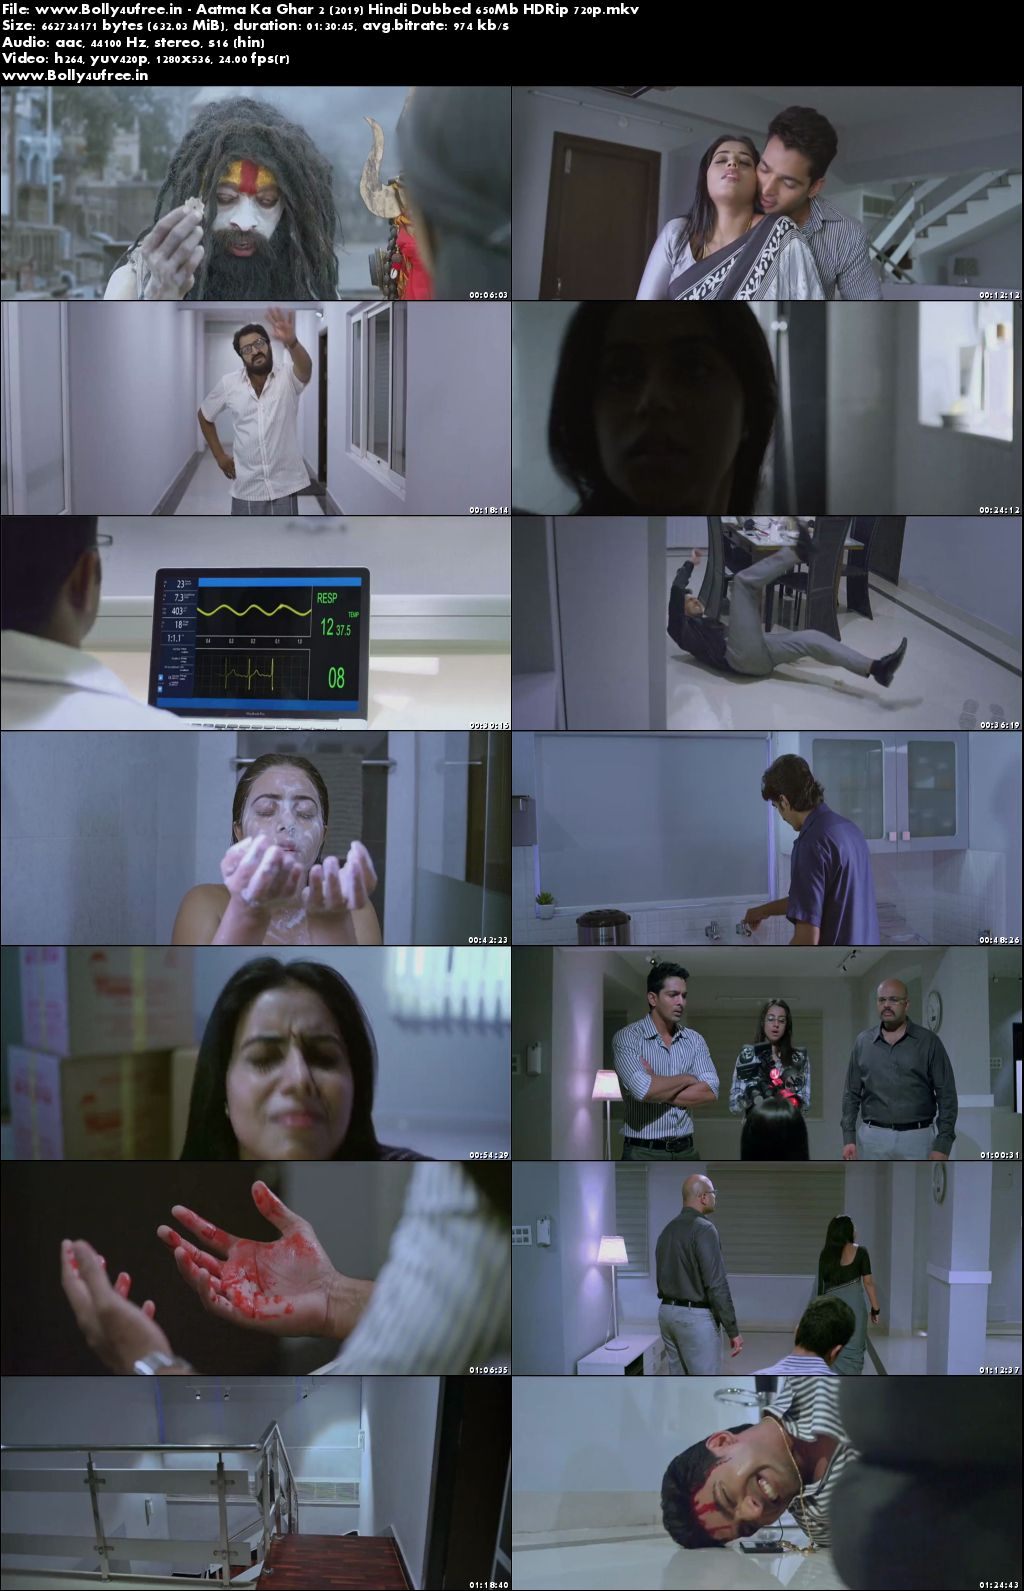 Aatma Ka Ghar 2 (2019) Hindi Dubbed 650Mb HDRip 720p